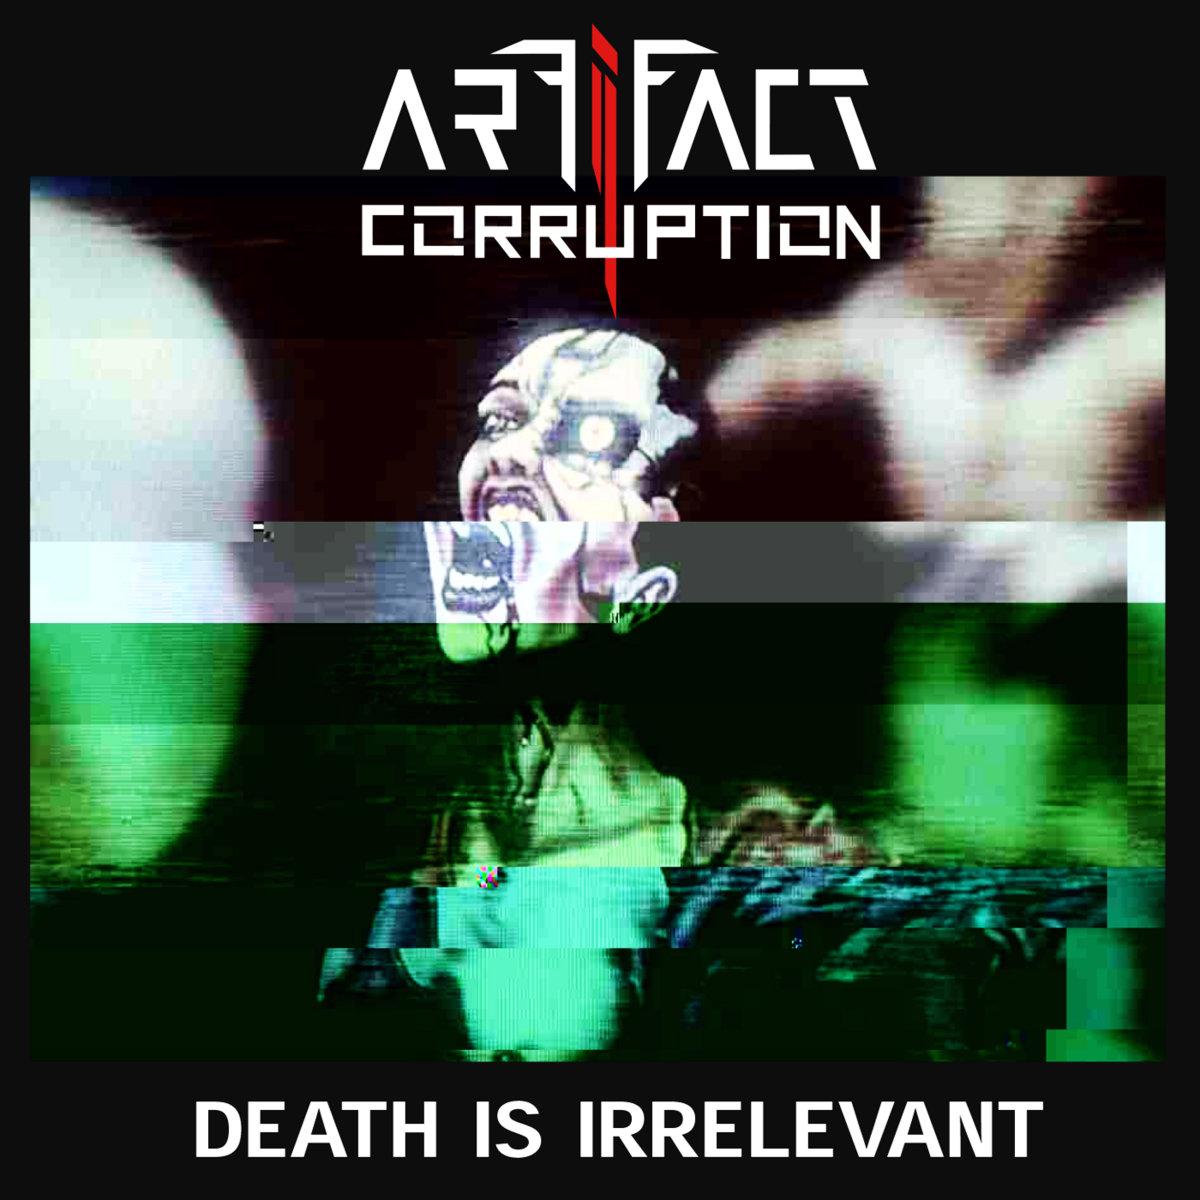 Death is Irrelevant Single | Artifact Corruption